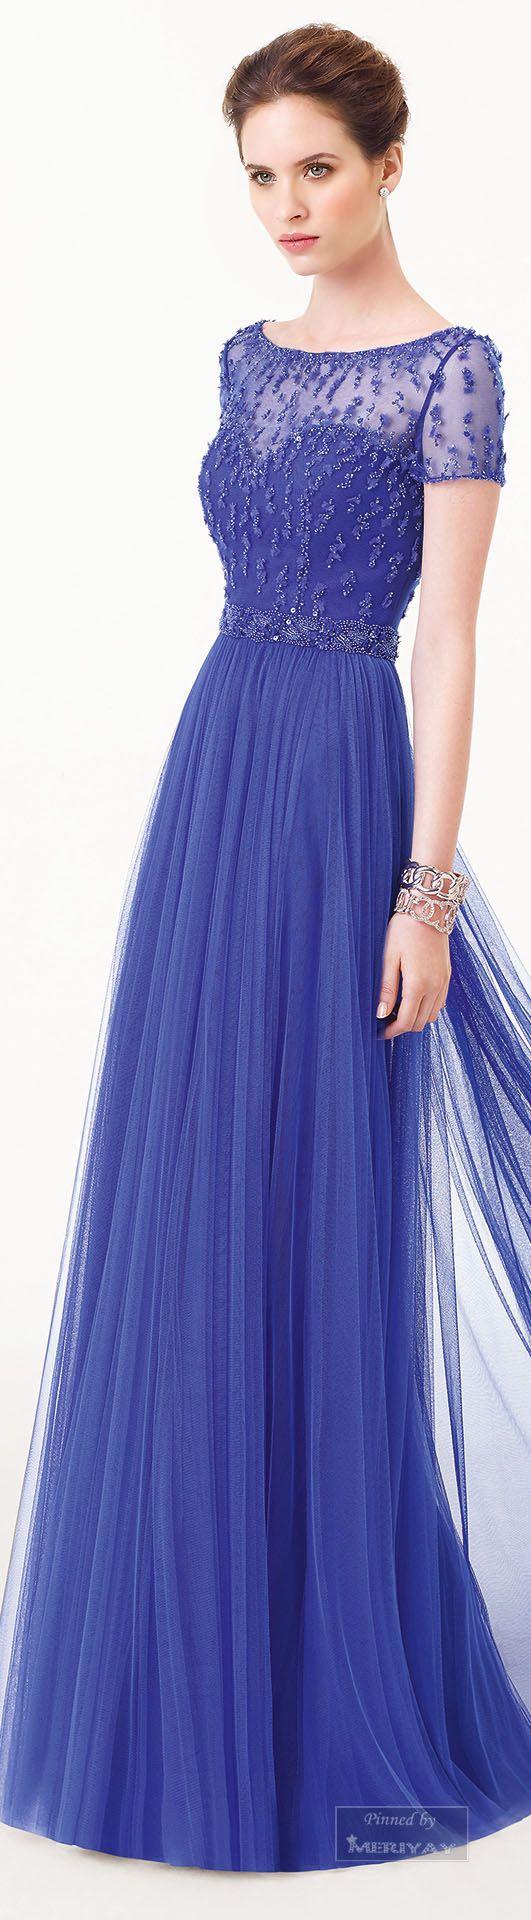 Lujo Vestido De Fiesta Azul Aqua Modelo - Vestido de Novia Para Las ...